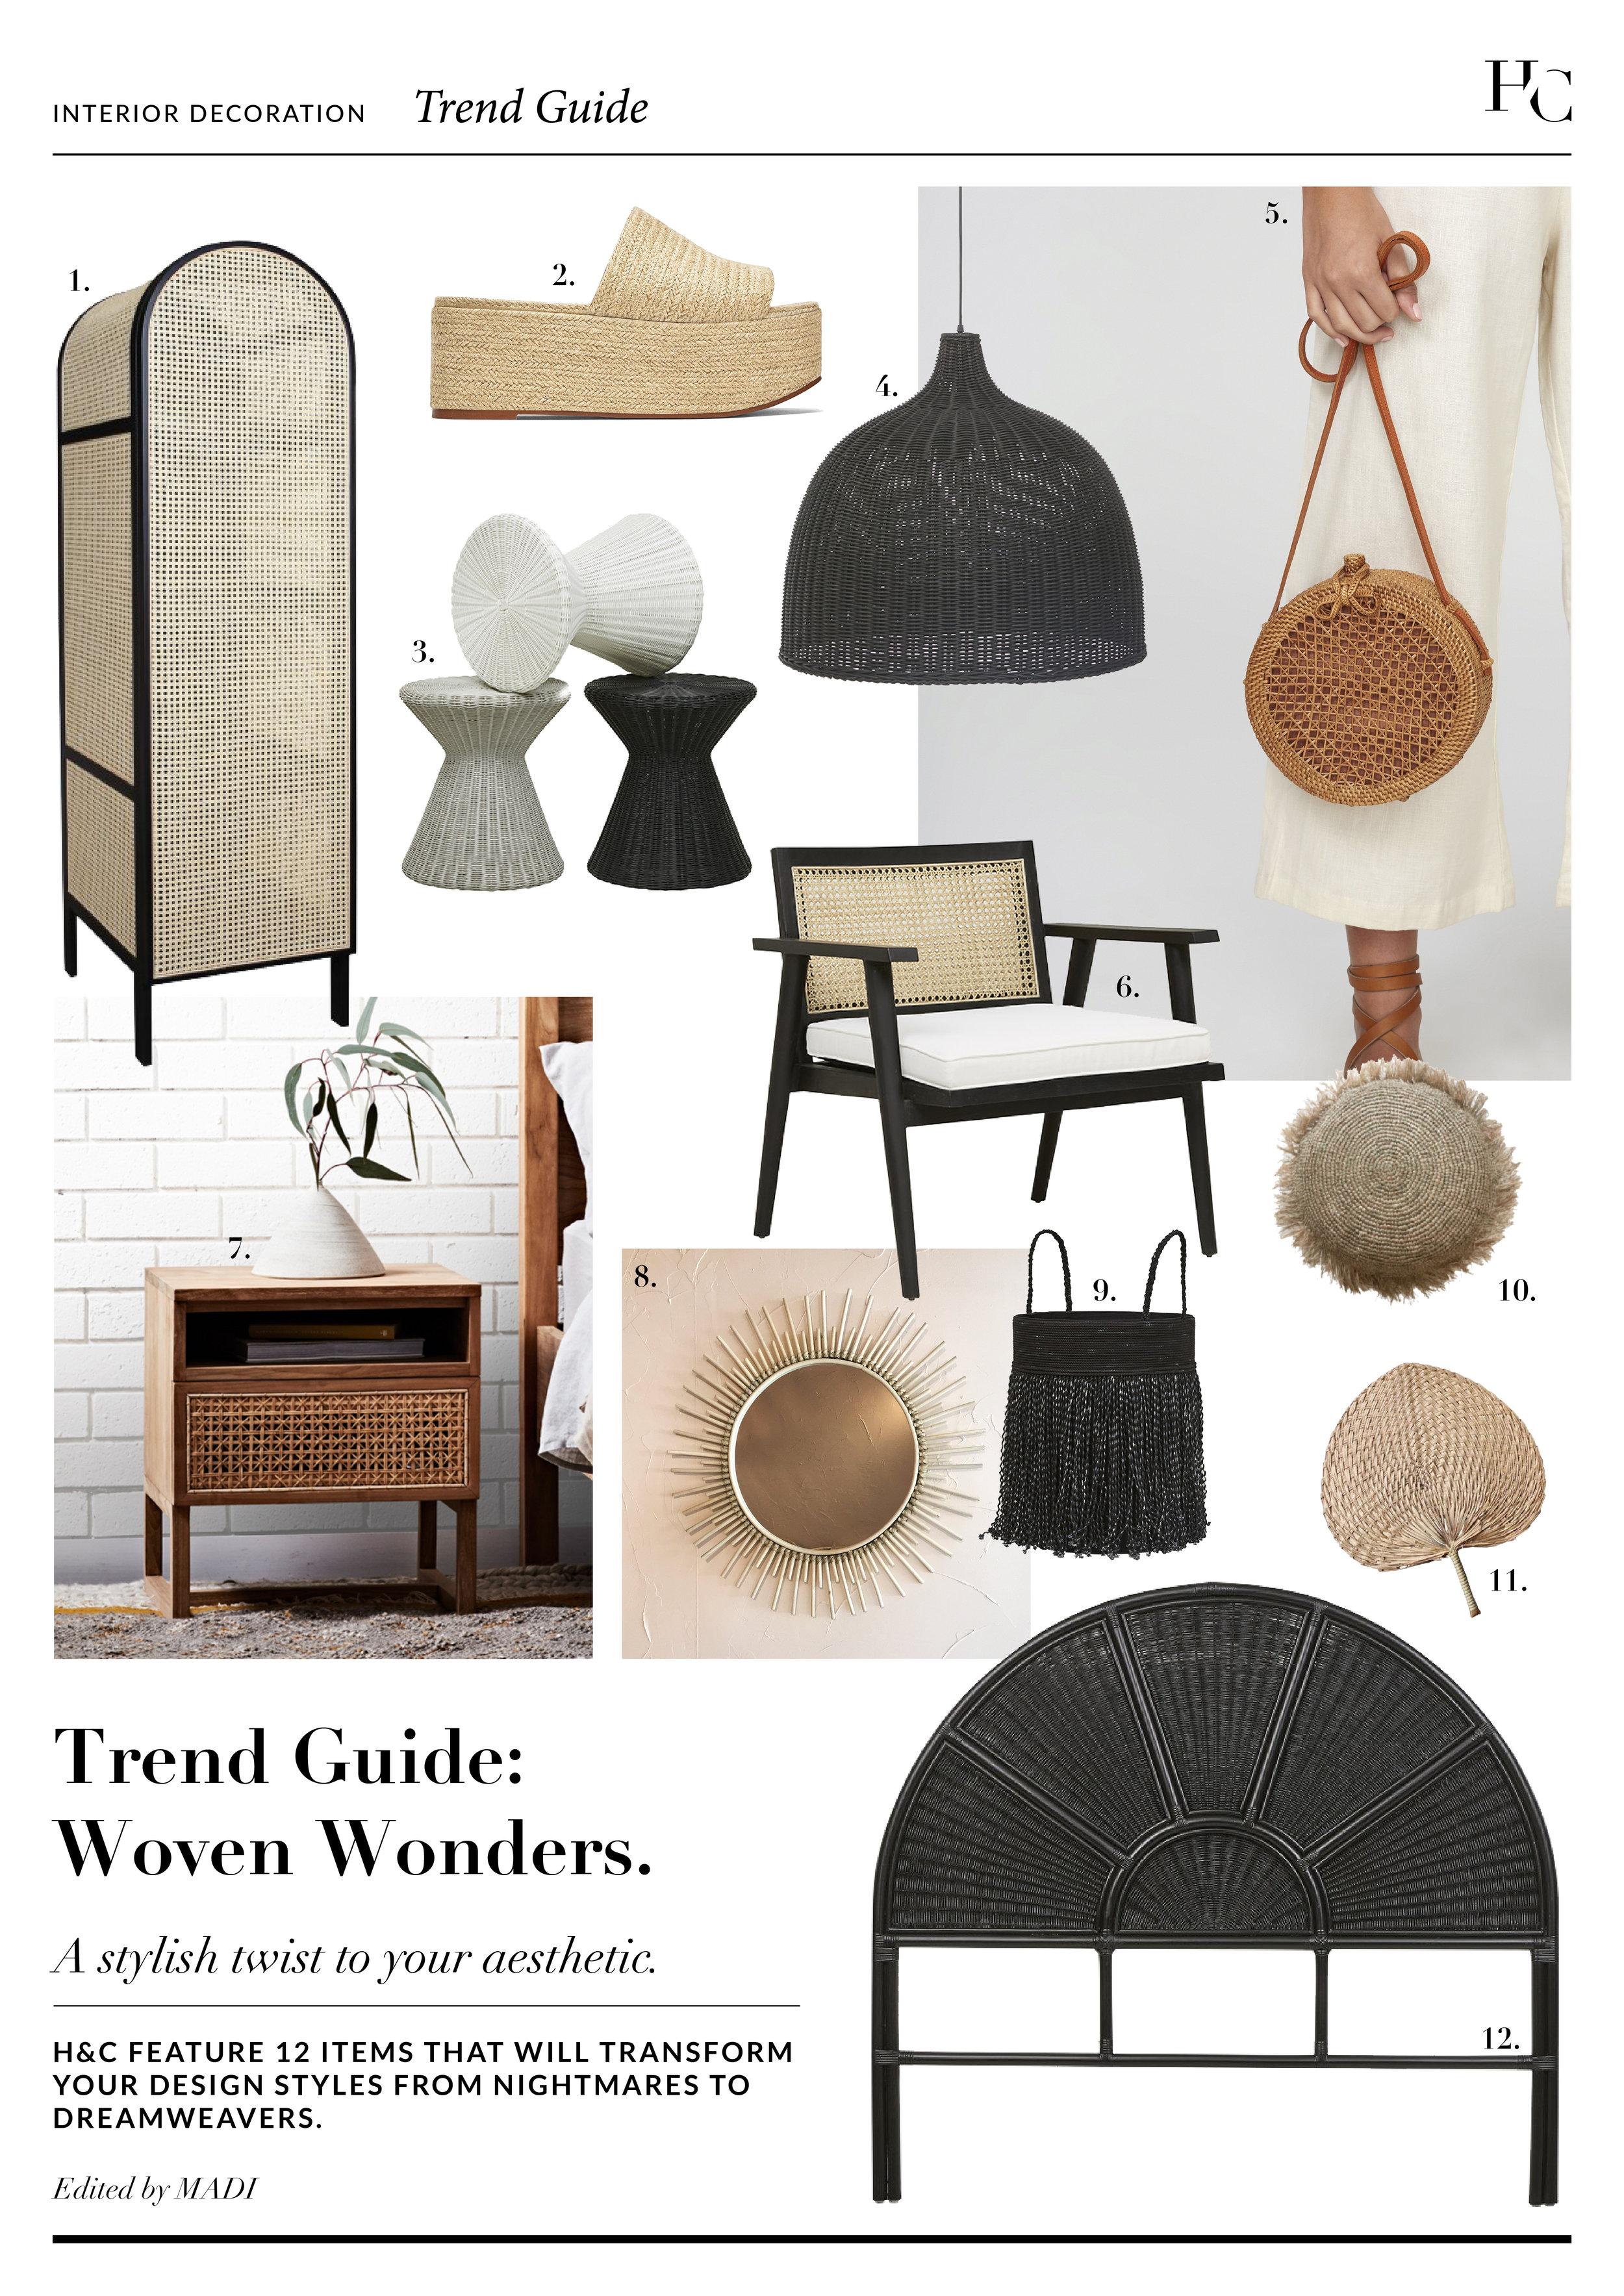 TREND GUIDE, WOVEN WONDERS, HOUSE & COURT, INTERIOR DESIGN, SYDNEY.jpg